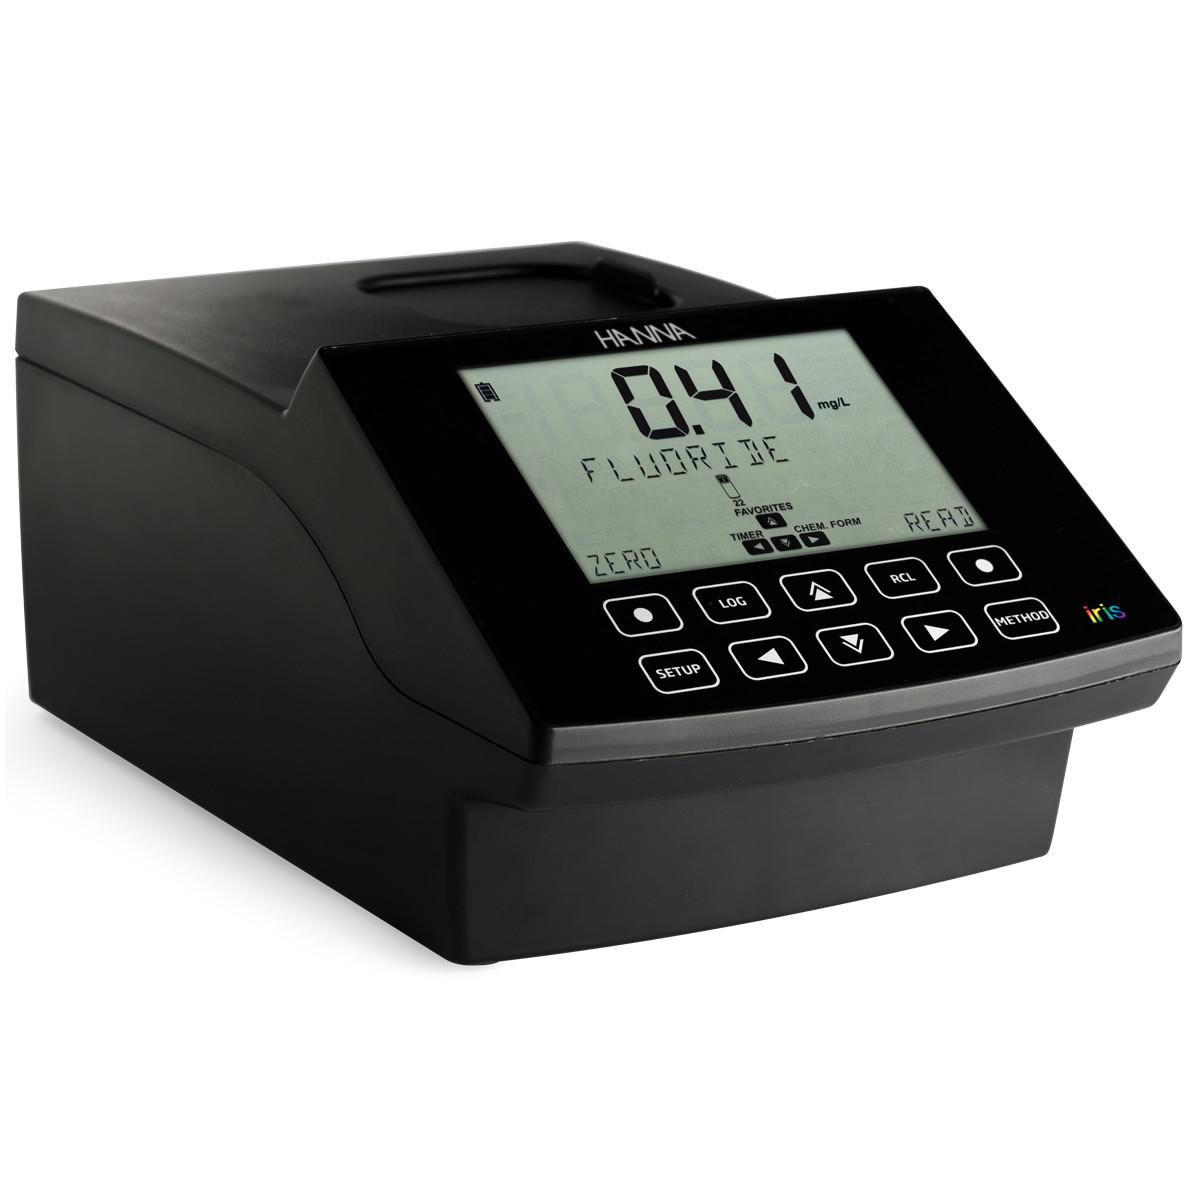 iris Visible Spectrophotometer